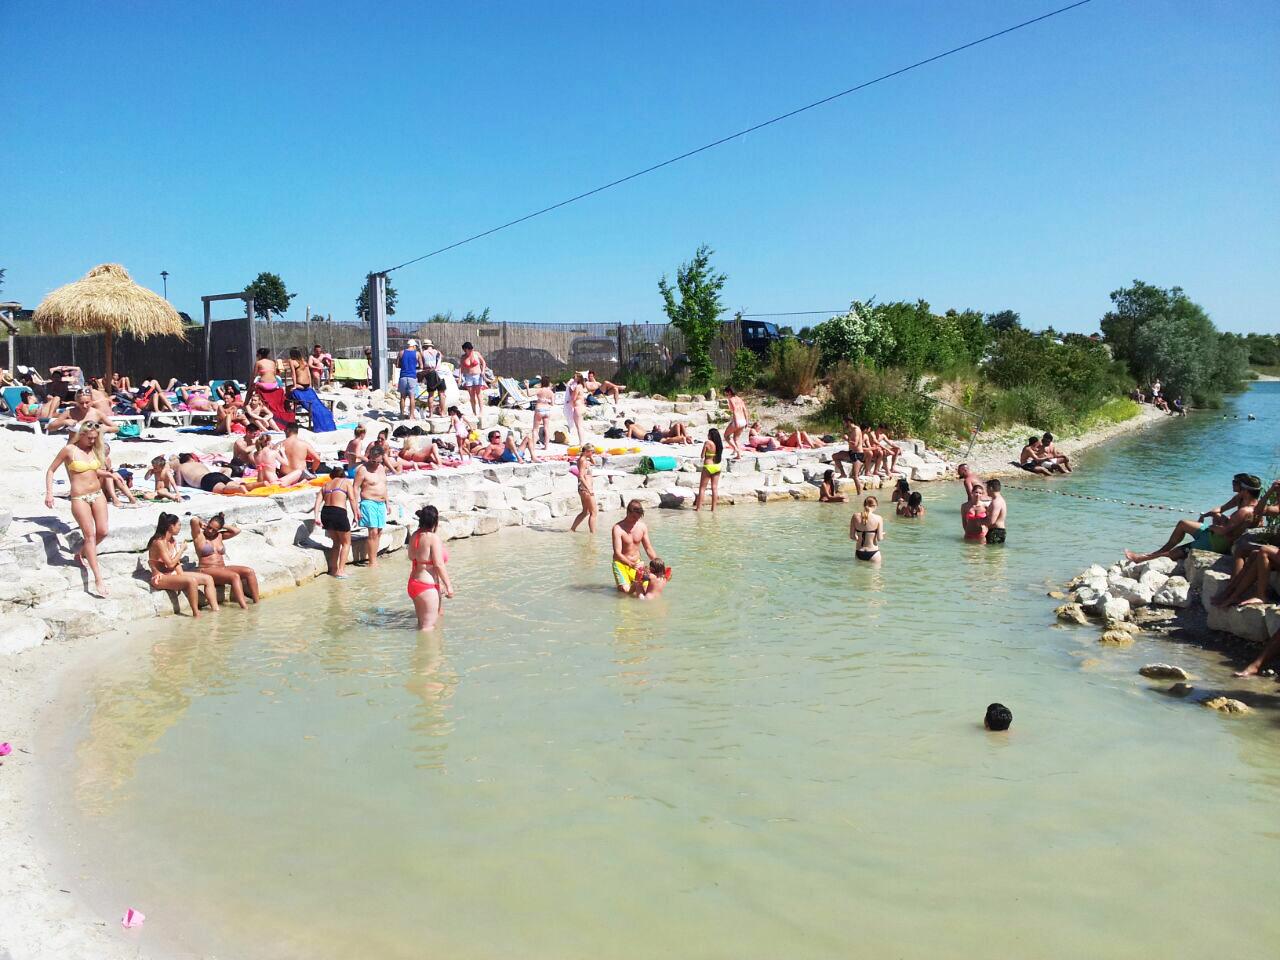 Roberto Beach - Karibikfeeling in Bayern